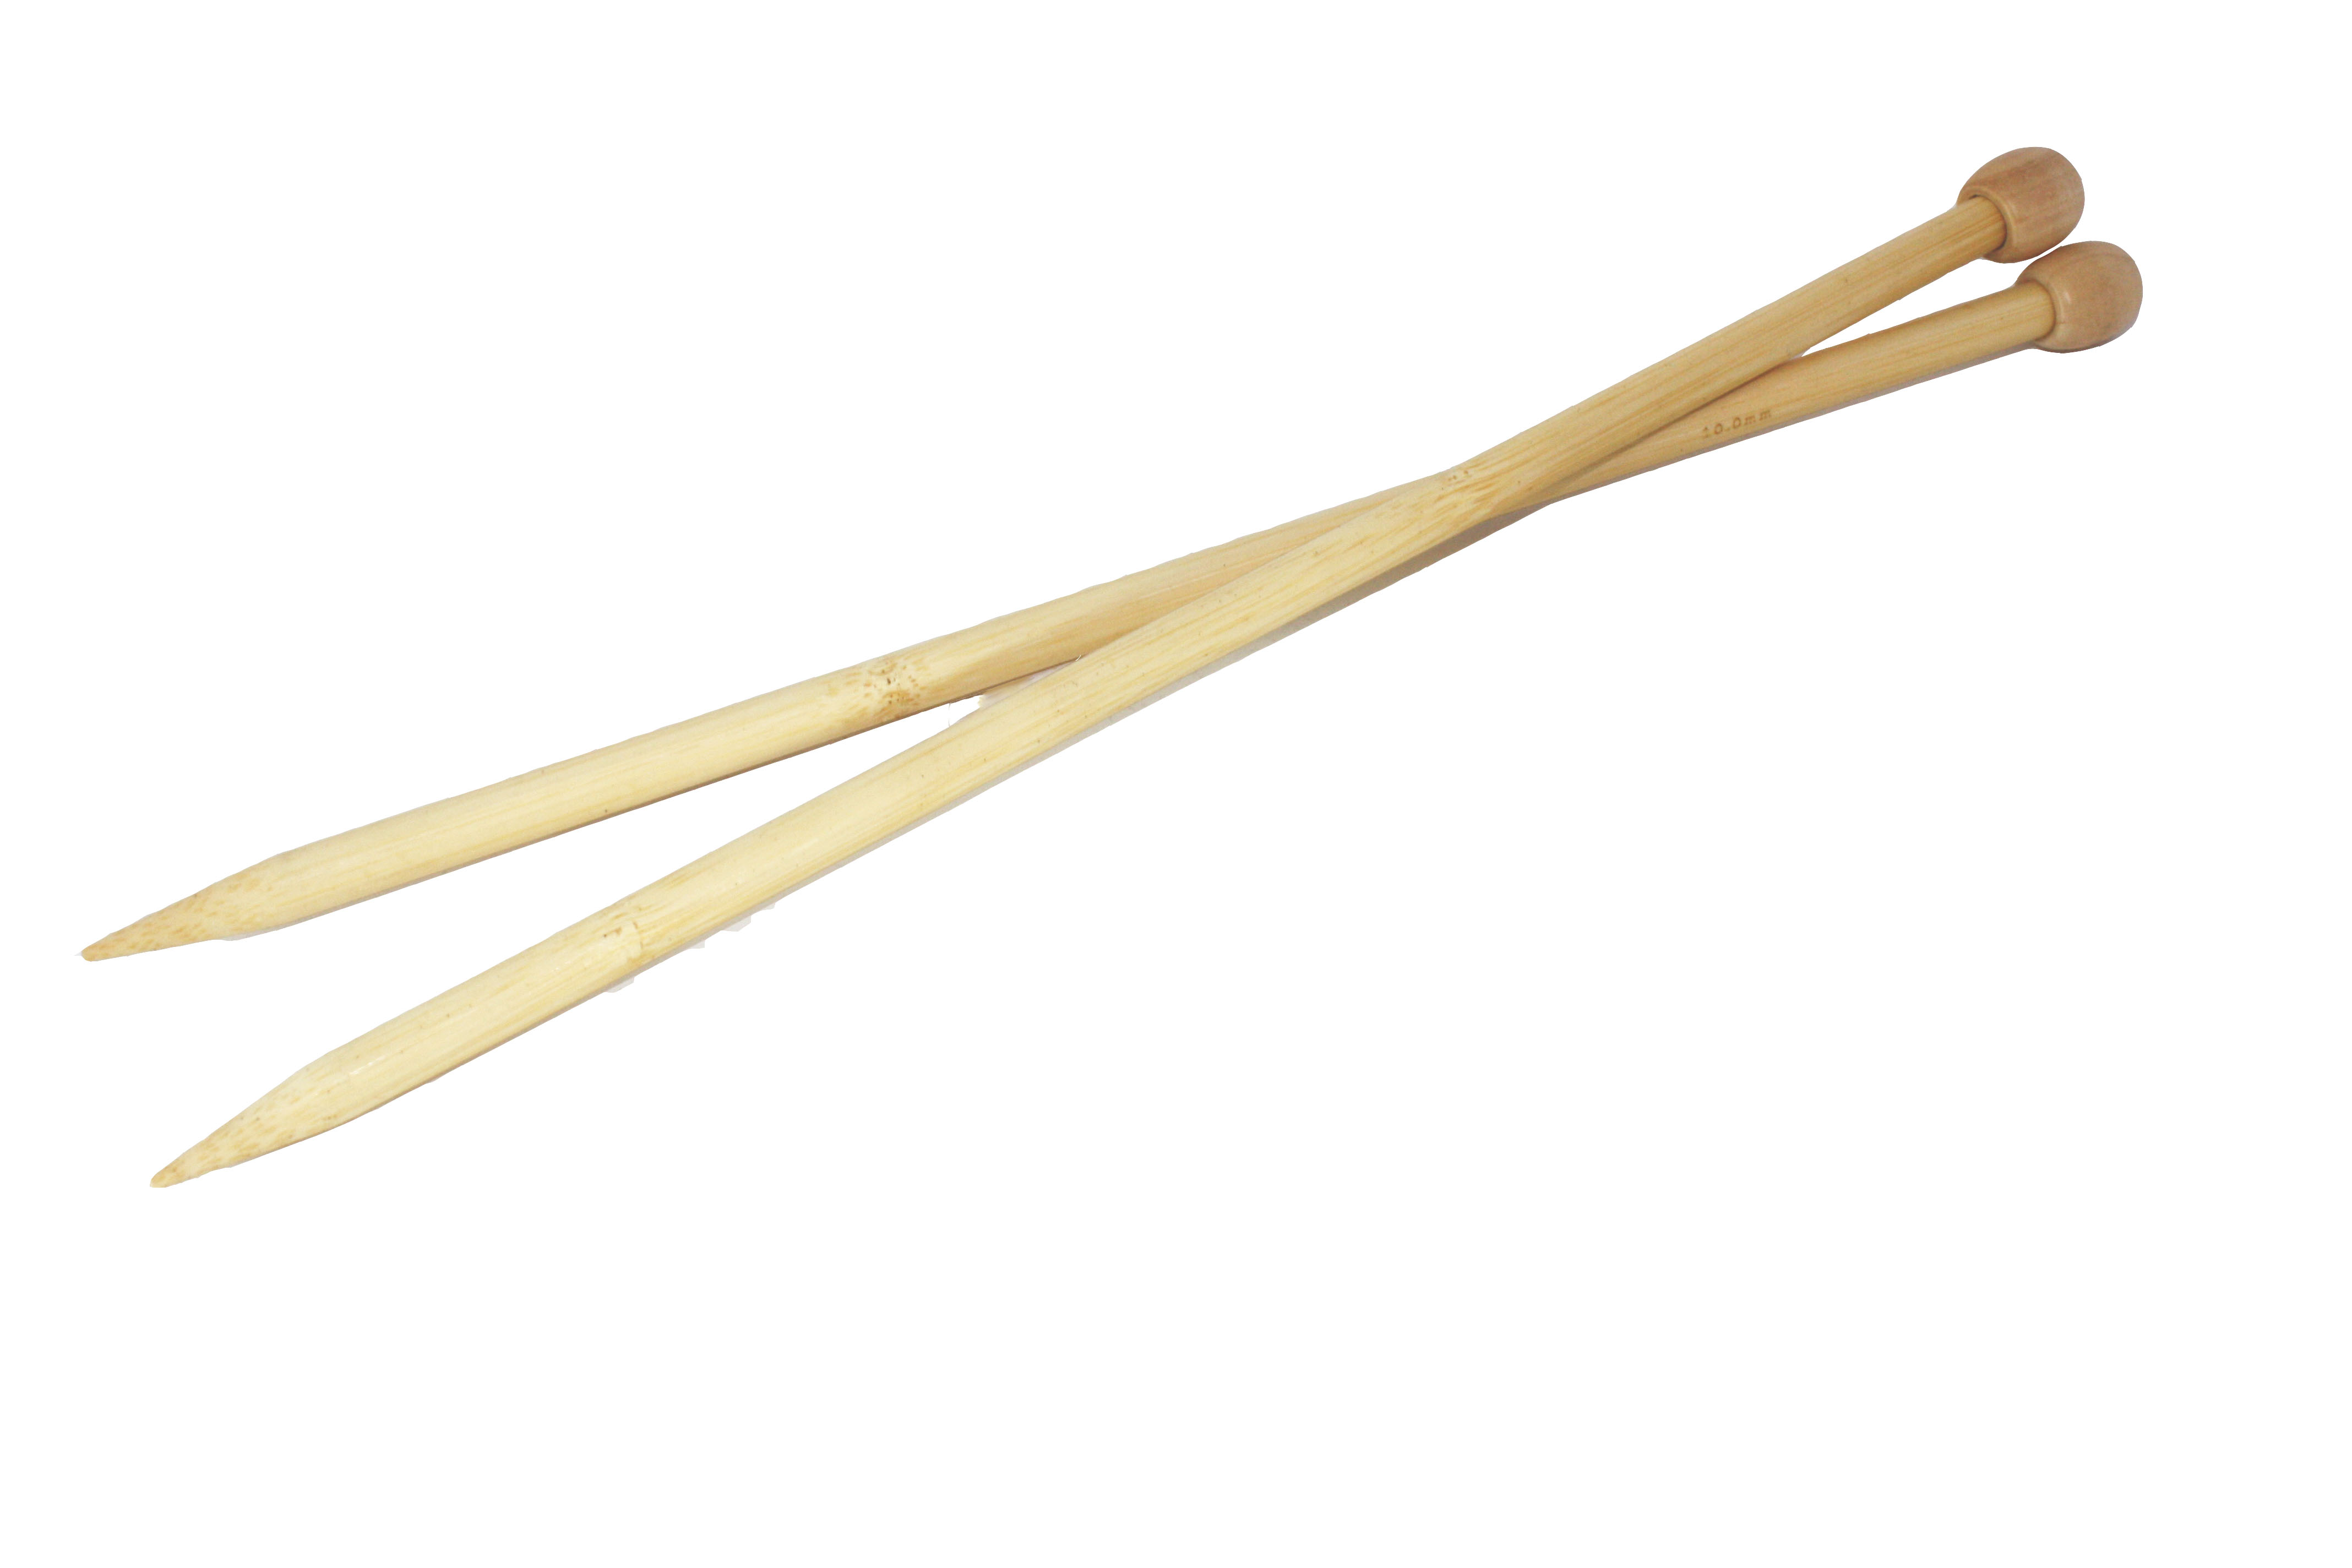 Knitting Needles Uk Flights : Bamboo knitting needles mm cm art craft factory